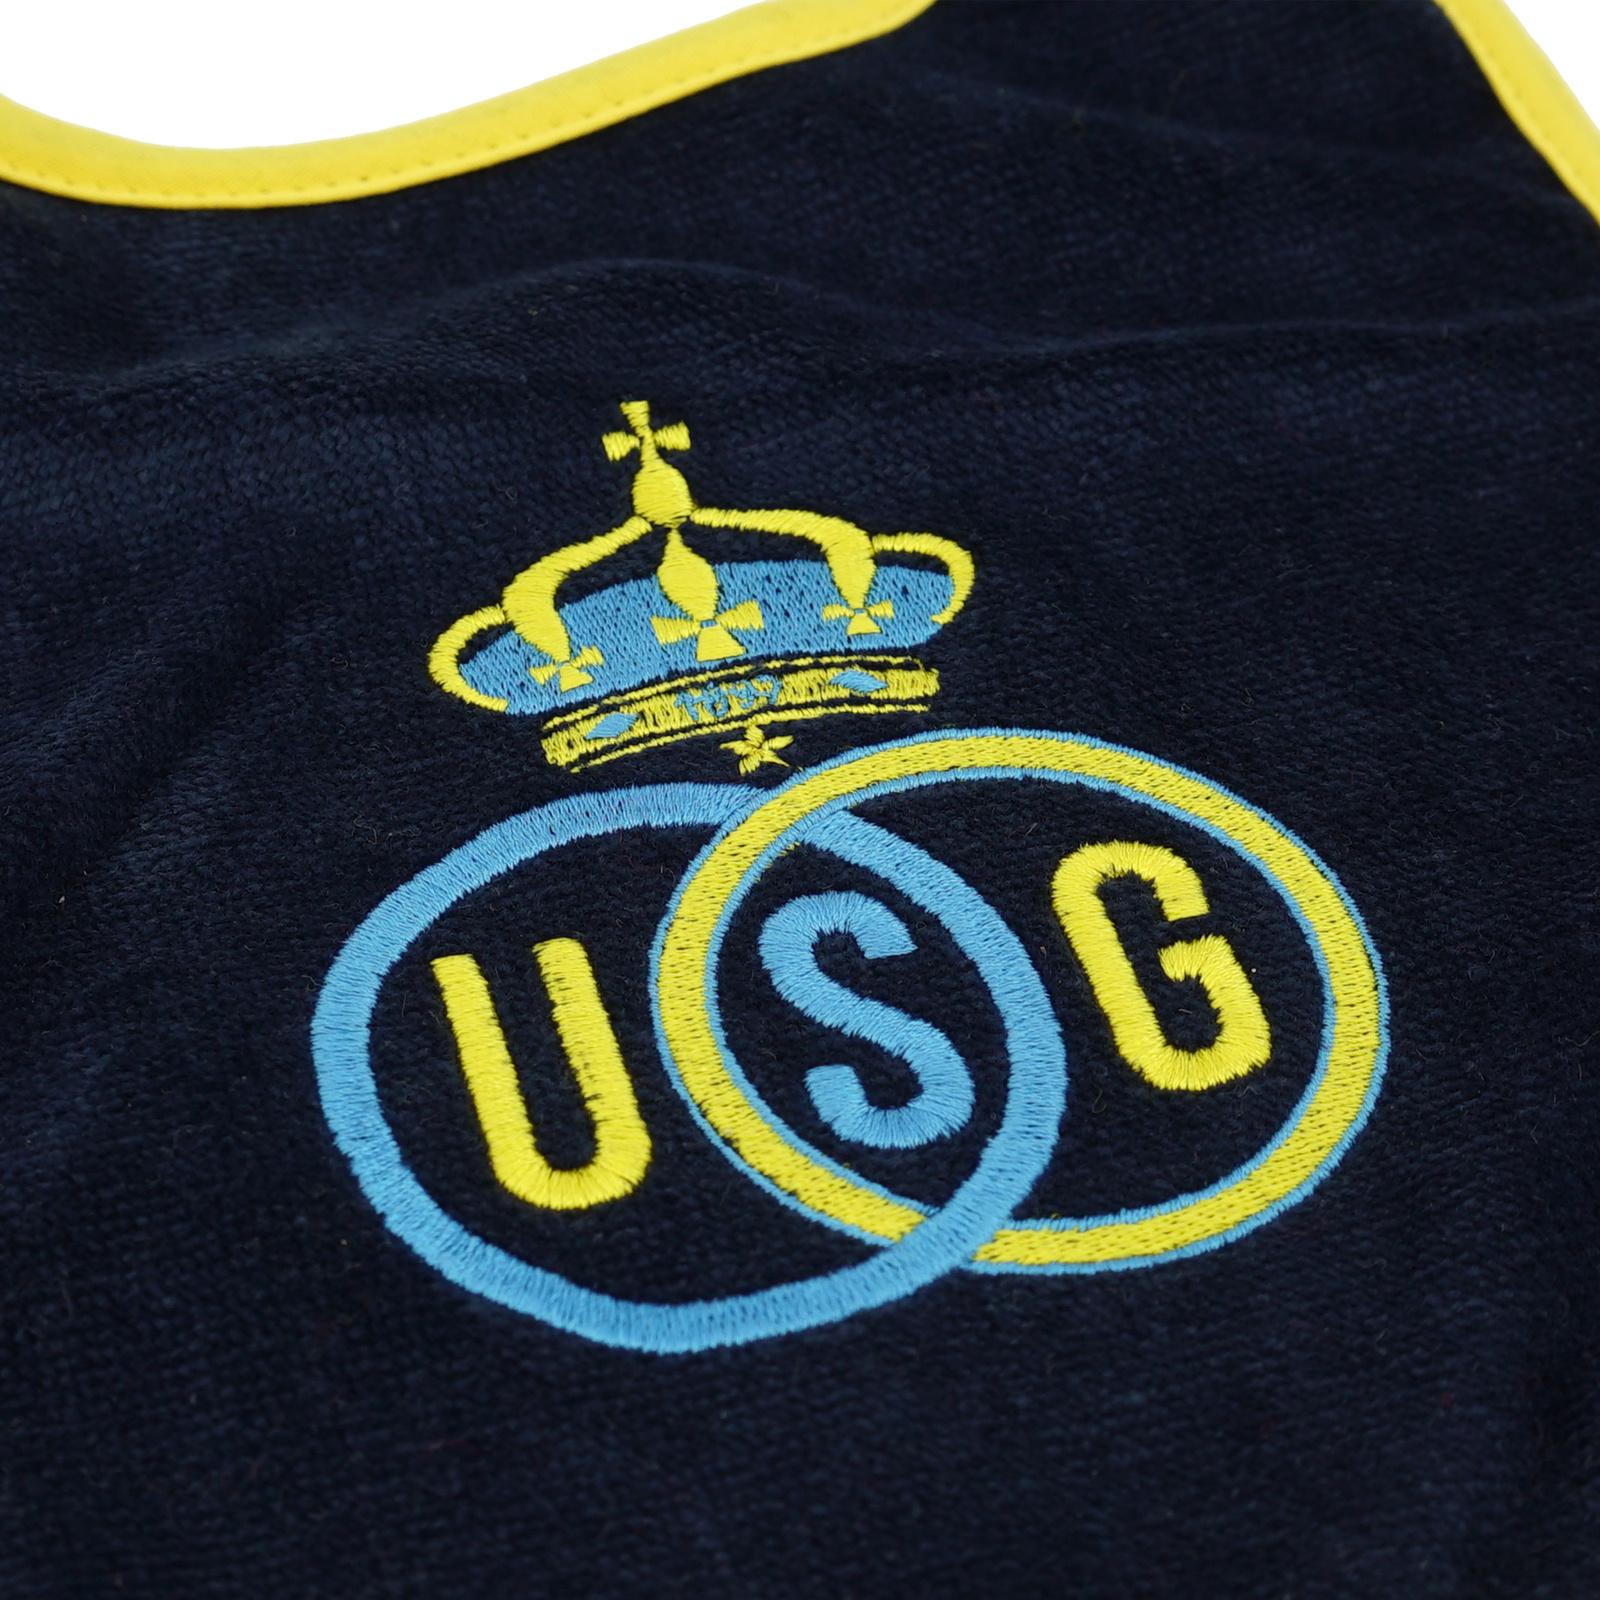 Topfanz Baby bib logo Union Saint-Gilloise